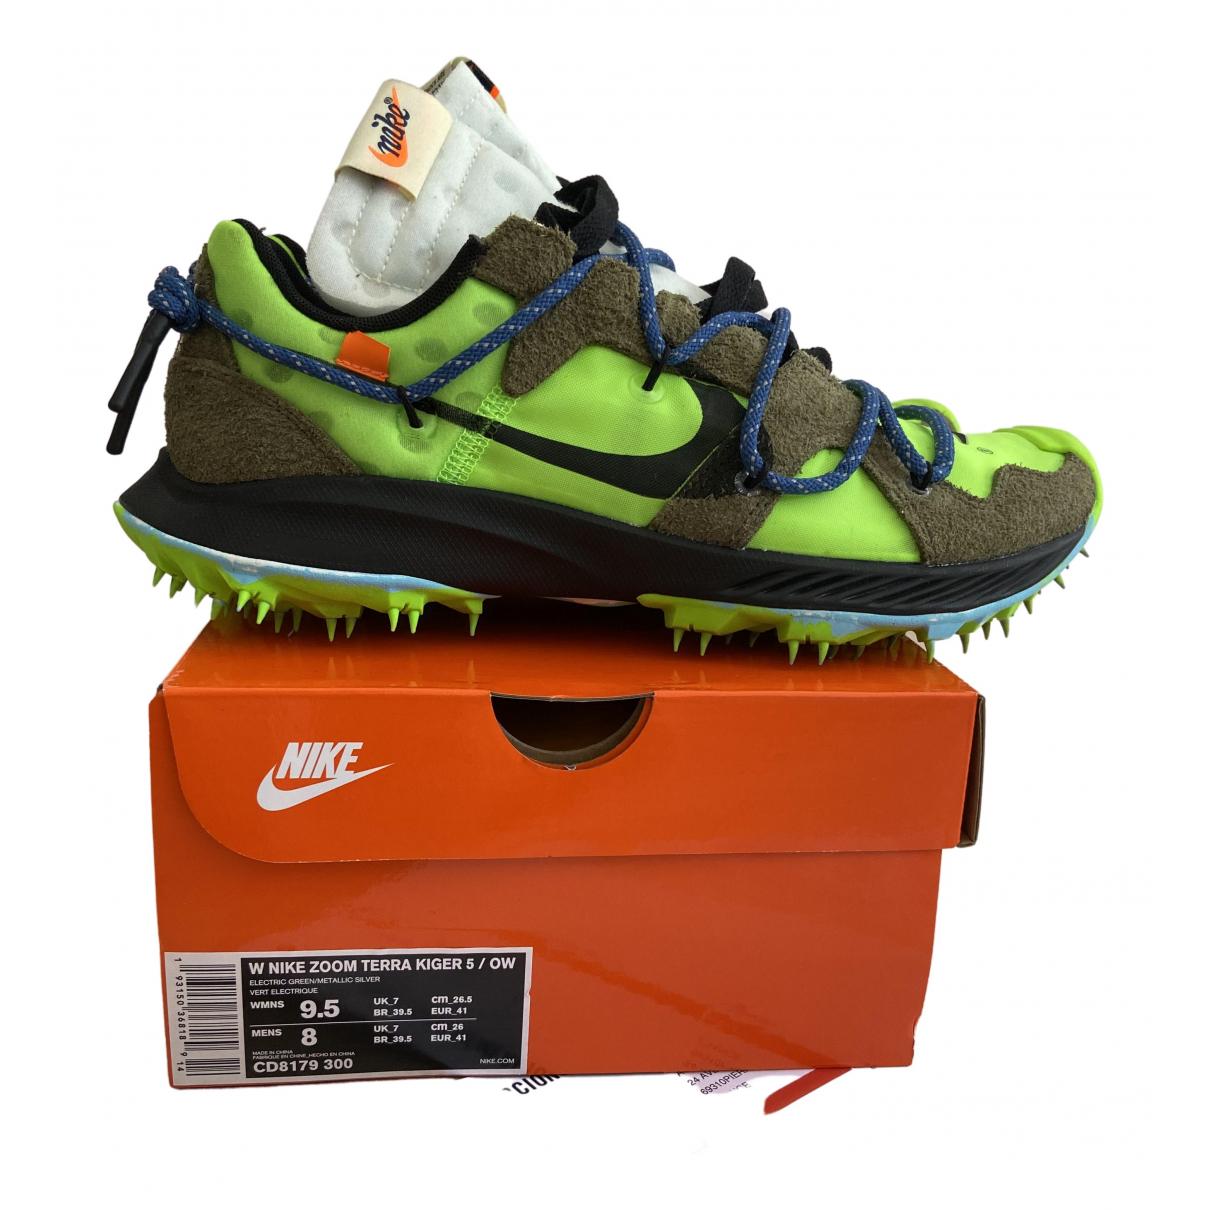 Nike X Off-white Zoom Terra Kiger 5 Sneakers in  Gruen Kunststoff